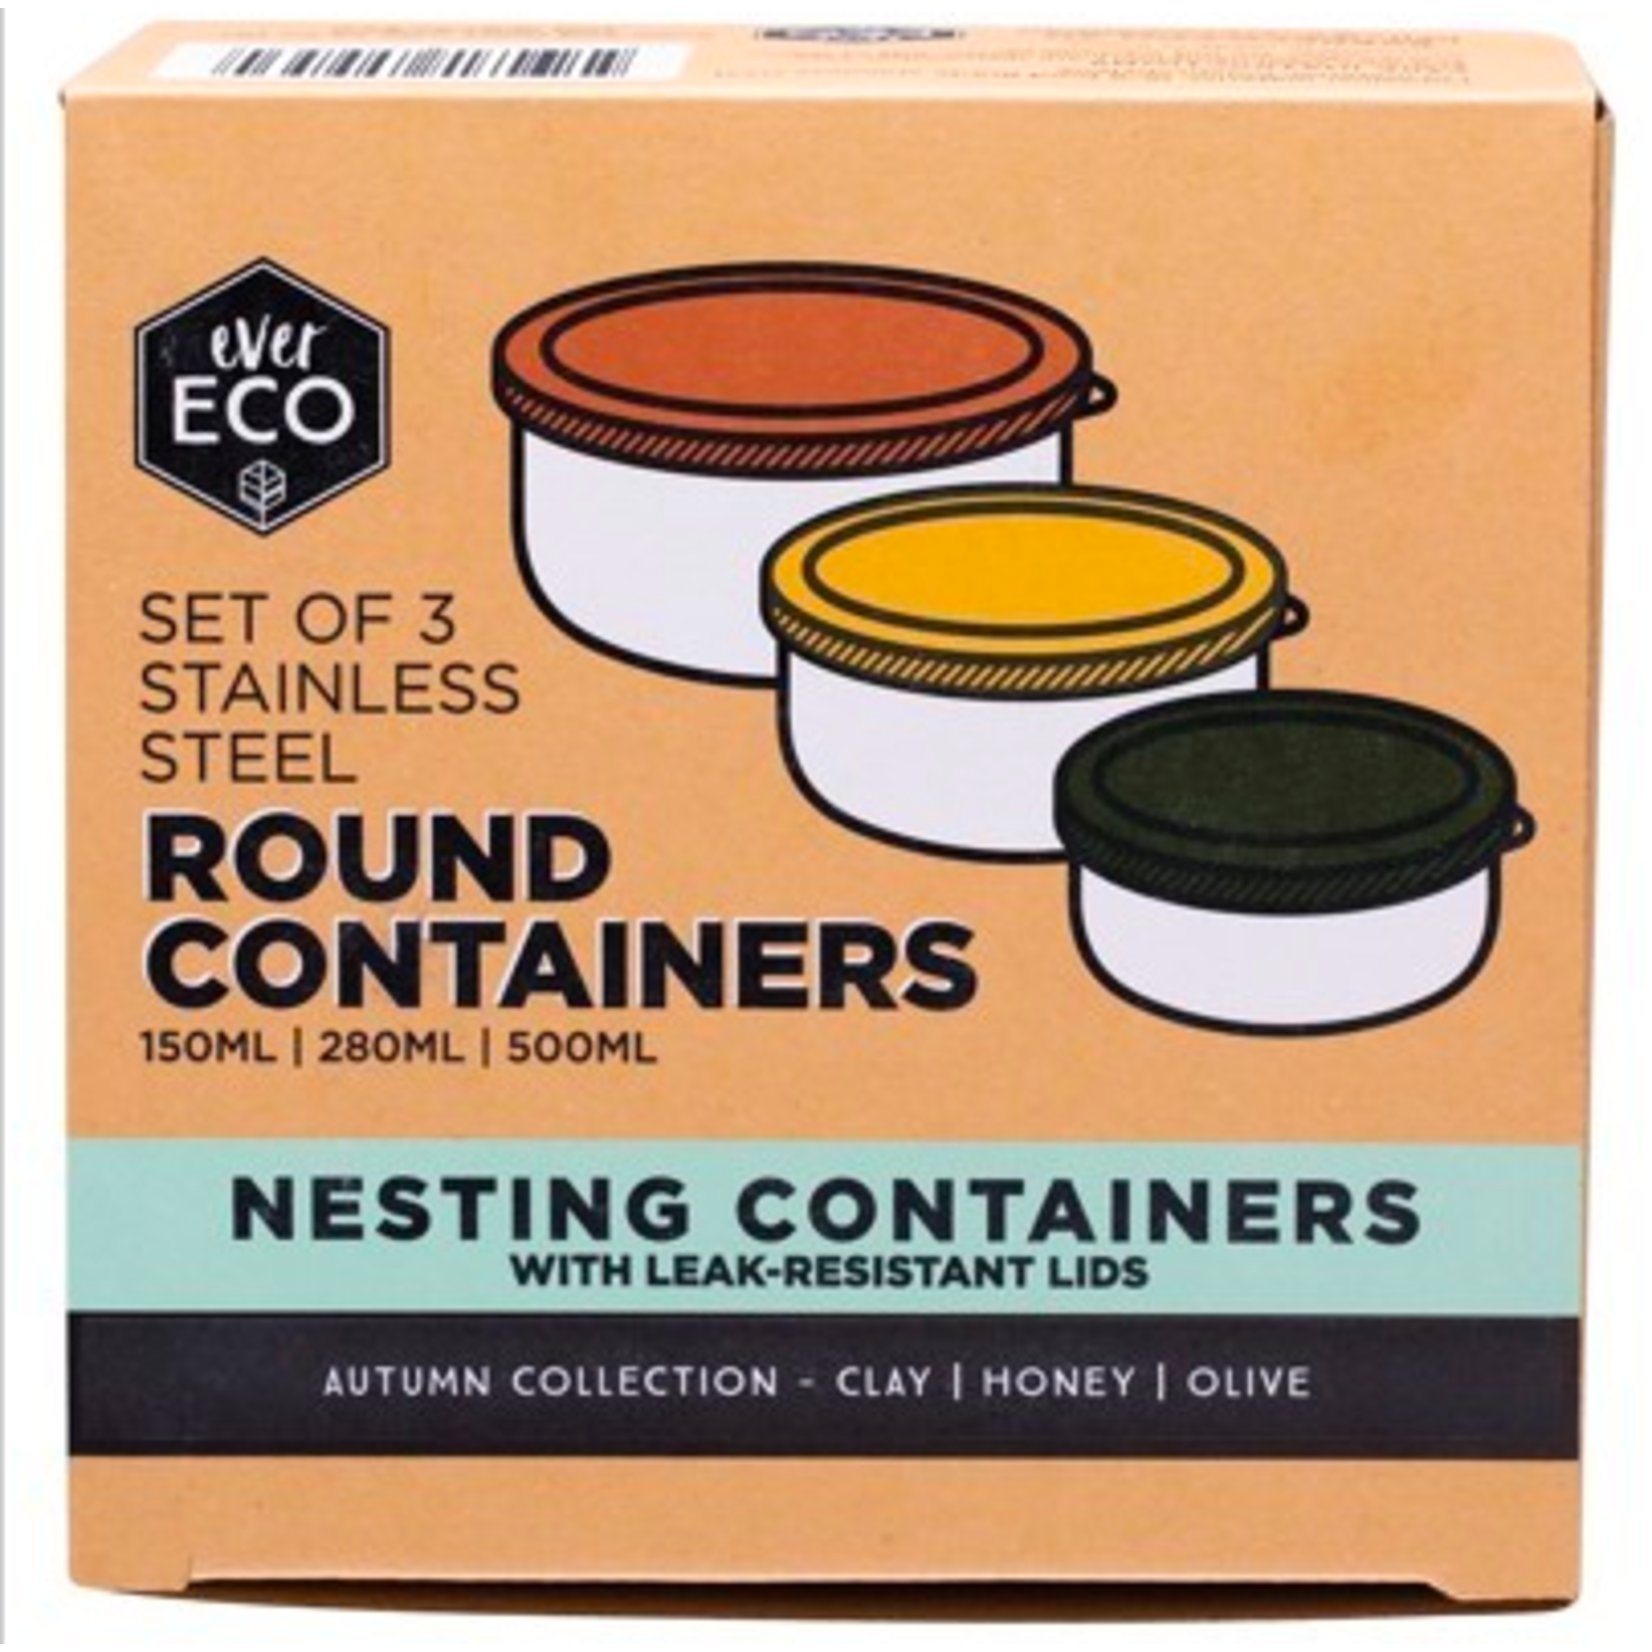 Ever Eco Ever Eco Round Containers 3pk - Autumn